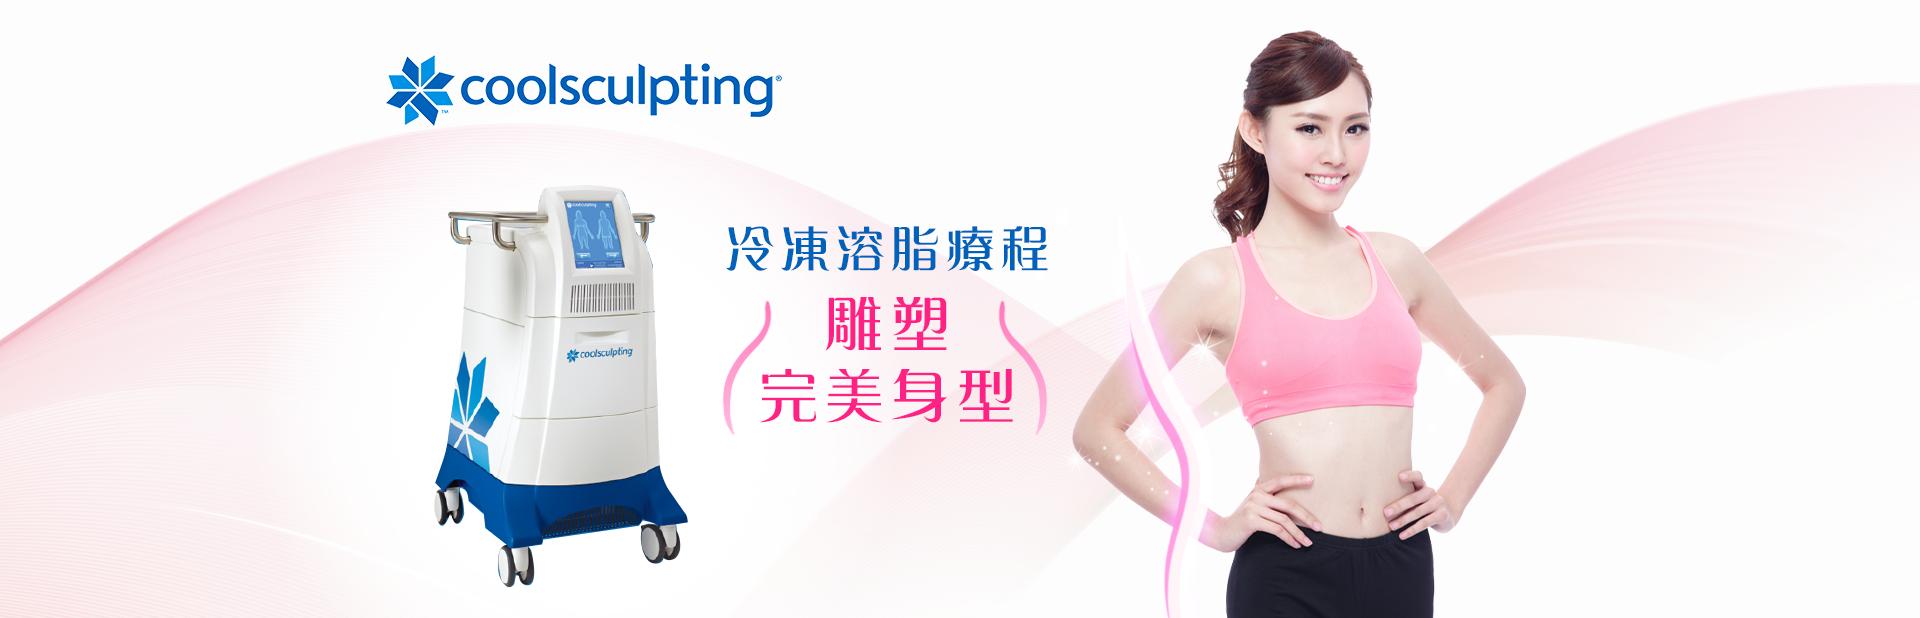 Coolsculpting®冷凍溶脂療程